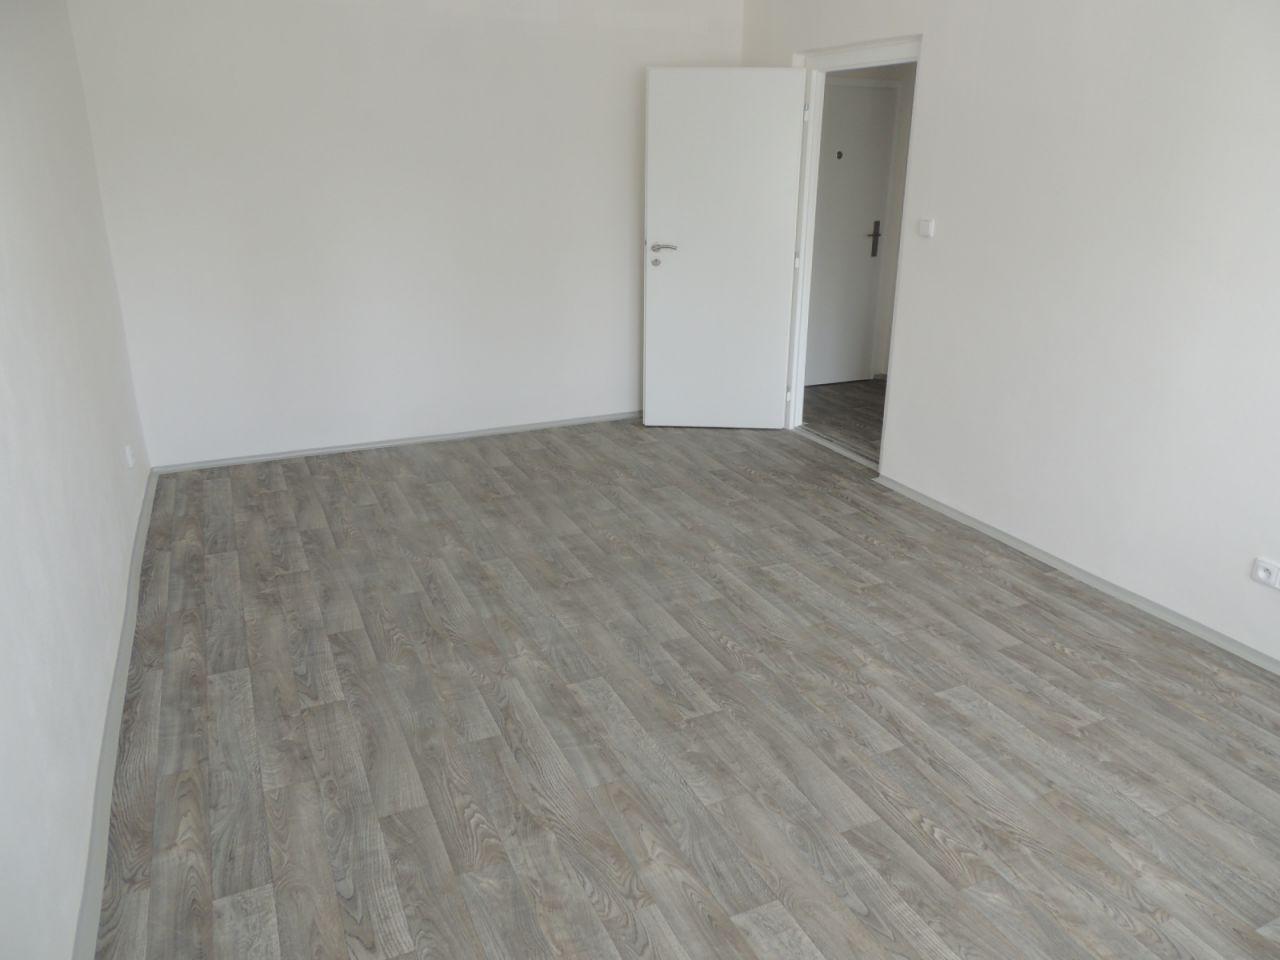 Pronájem bytu 1+1 39 m2, ul. U Haldy 1543/62, Ostrava - Hrabůvka